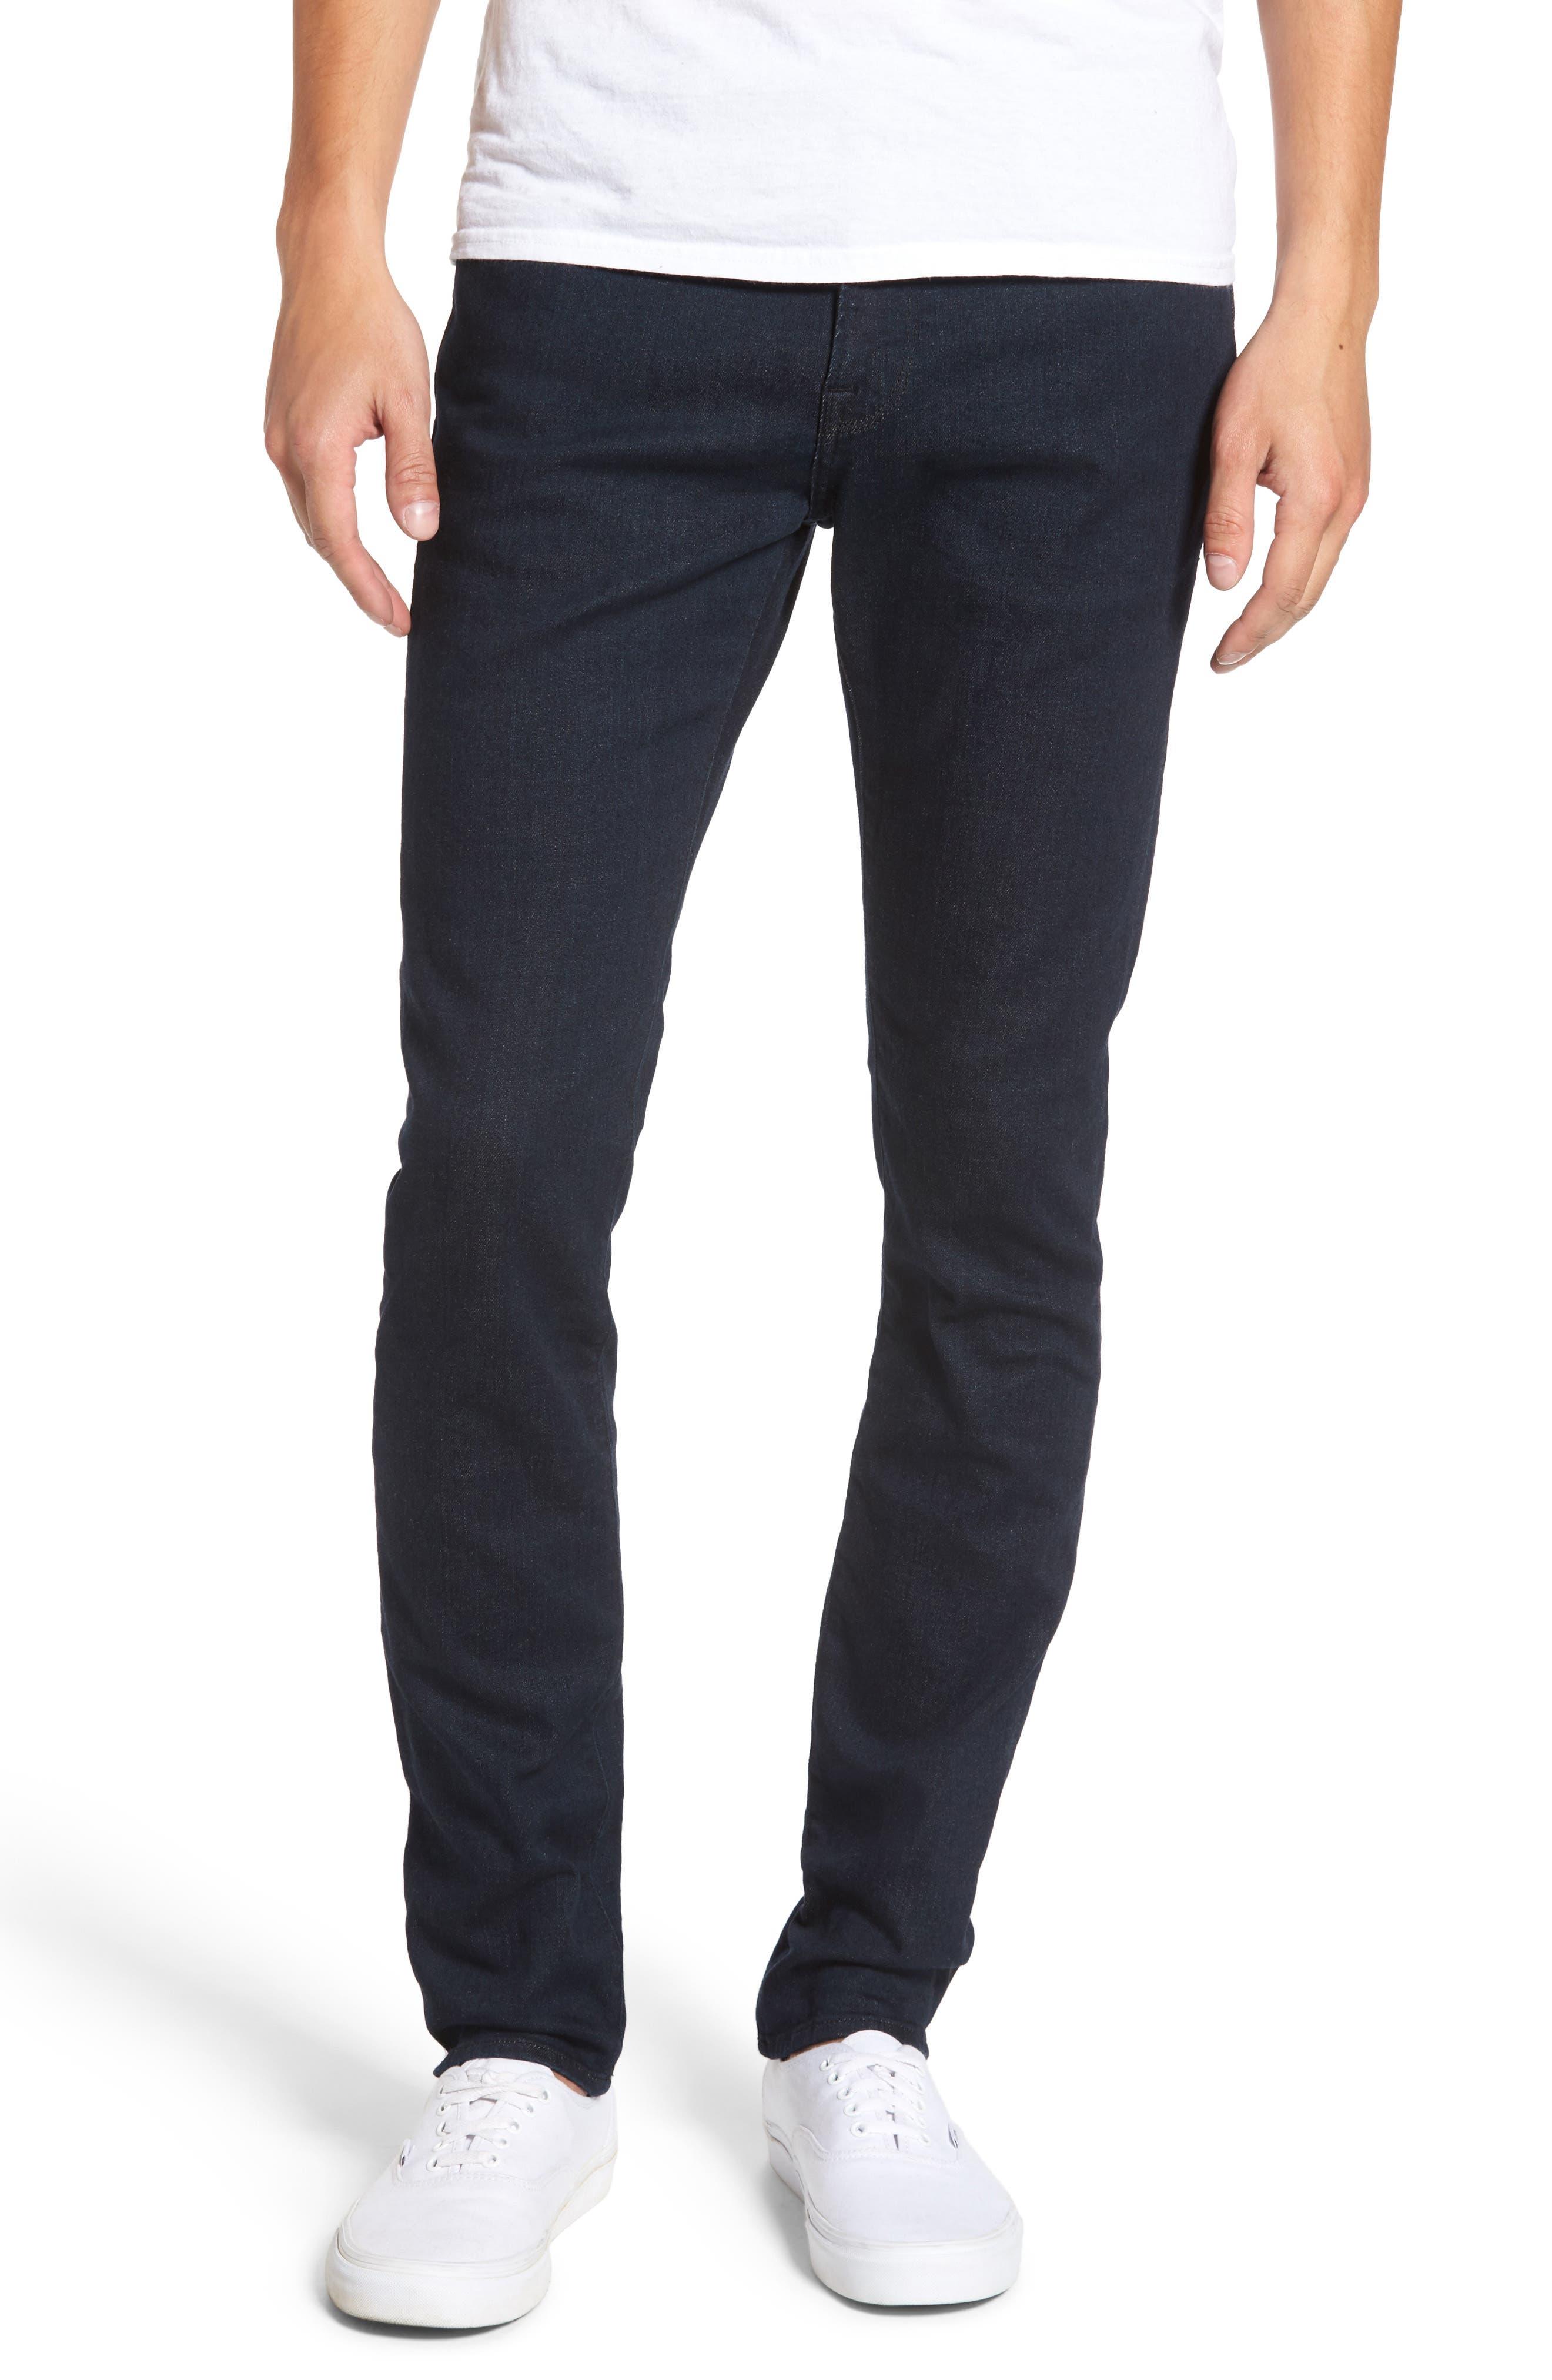 L'Homme Skinny Fit Jeans,                         Main,                         color, Edison